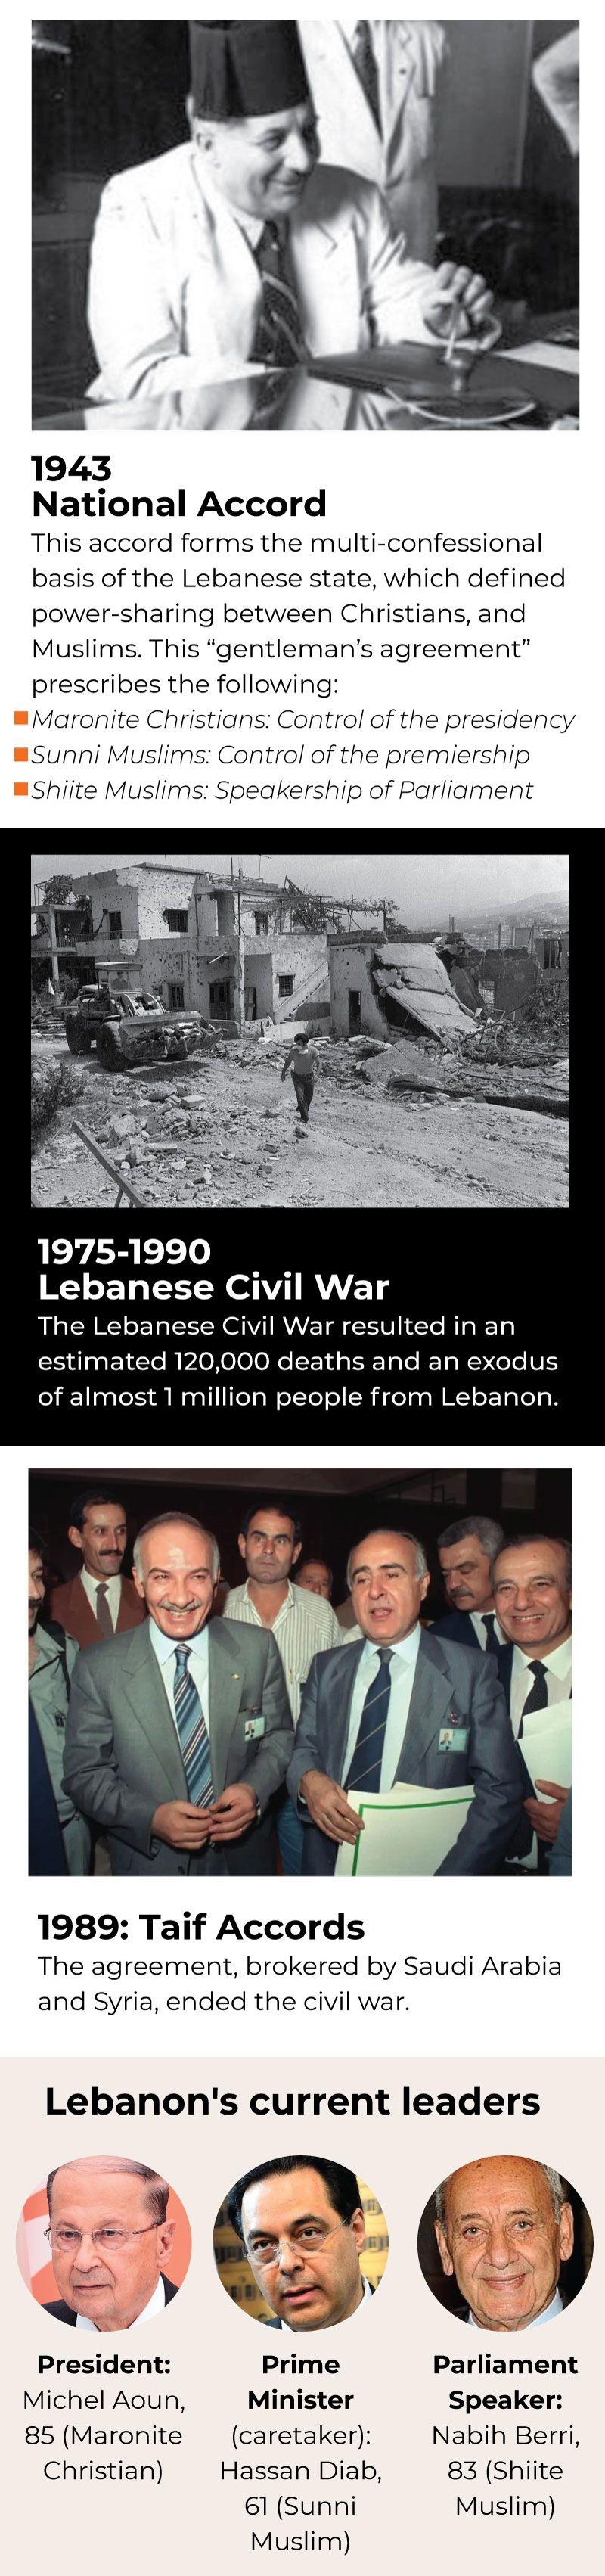 Lebanon Maronites Muslim Sunni Shia